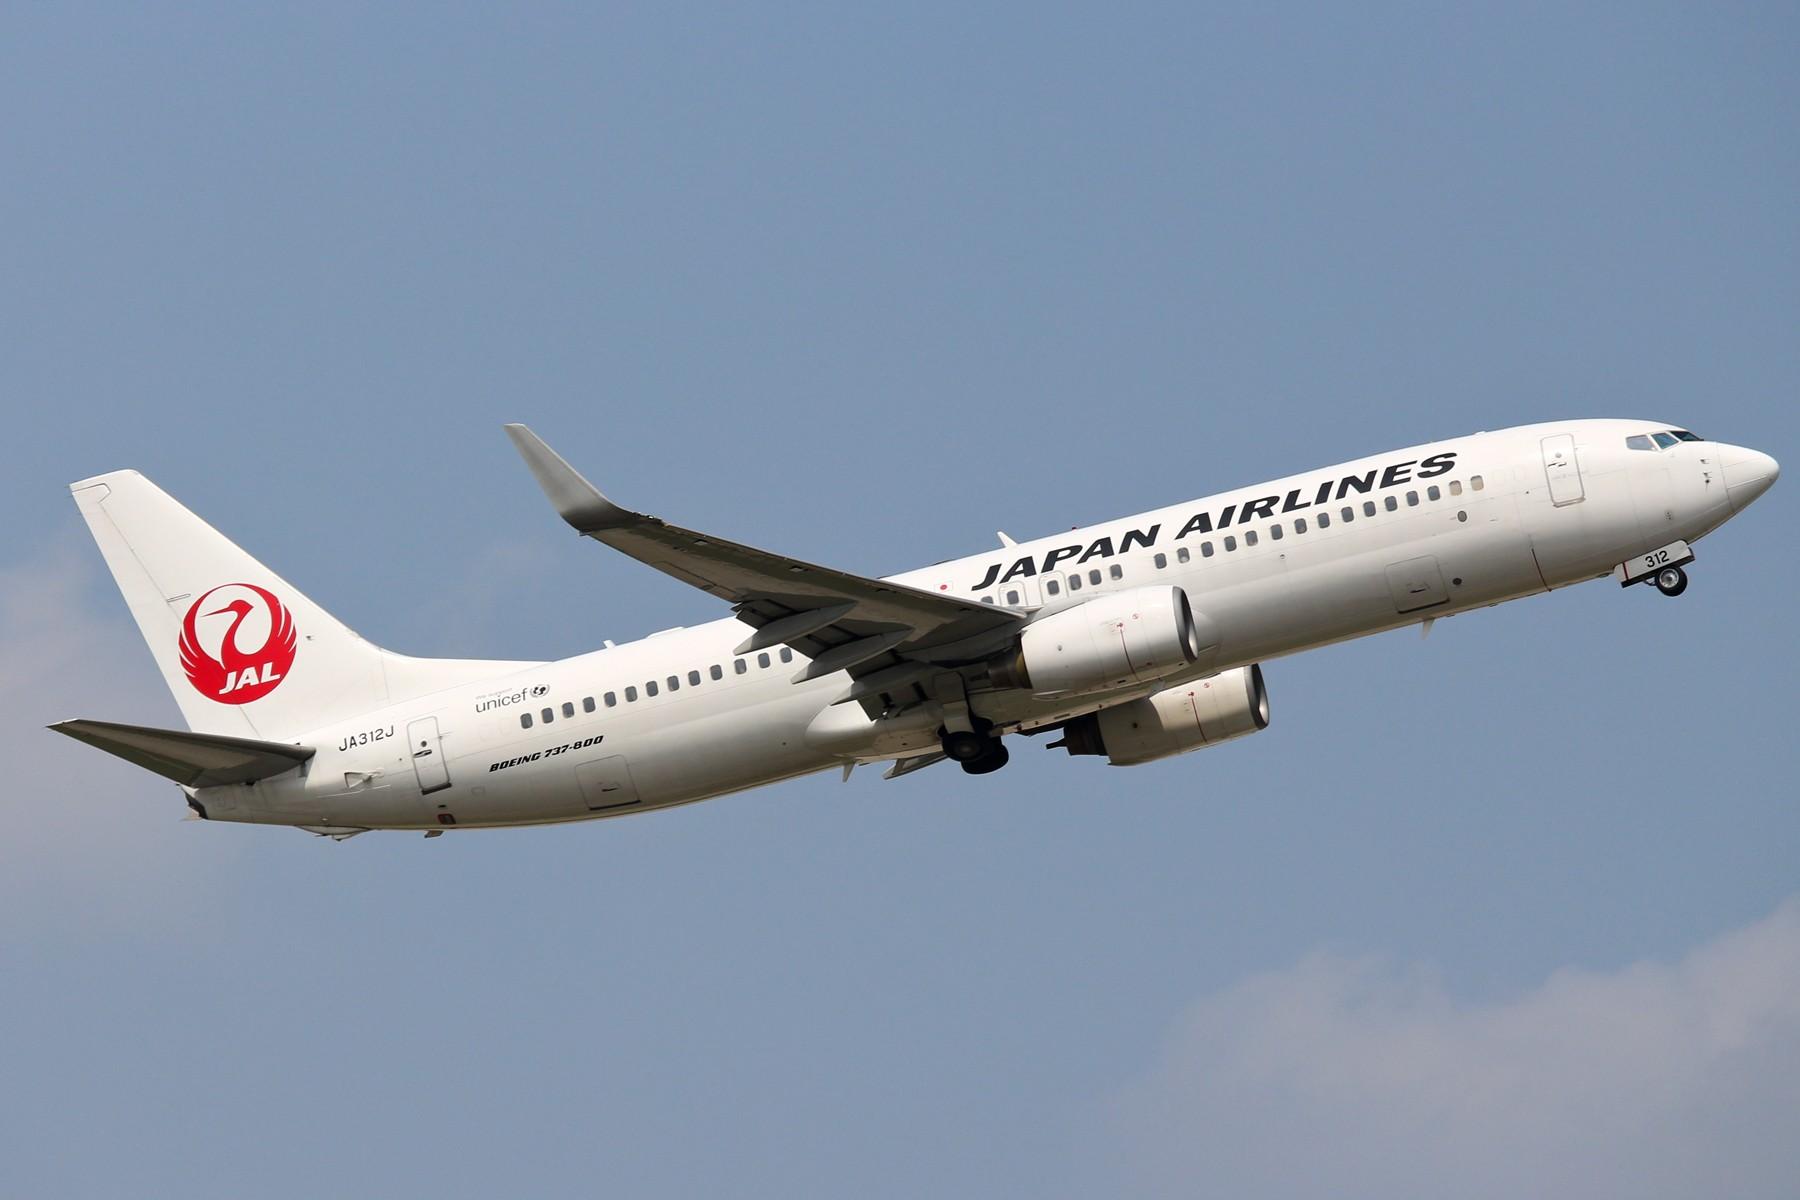 Re:[原创]【TSN飞友会】1800*1200 近期TSN集锦 不看绝对后悔 BOEING 737-800  中国天津滨海国际机场